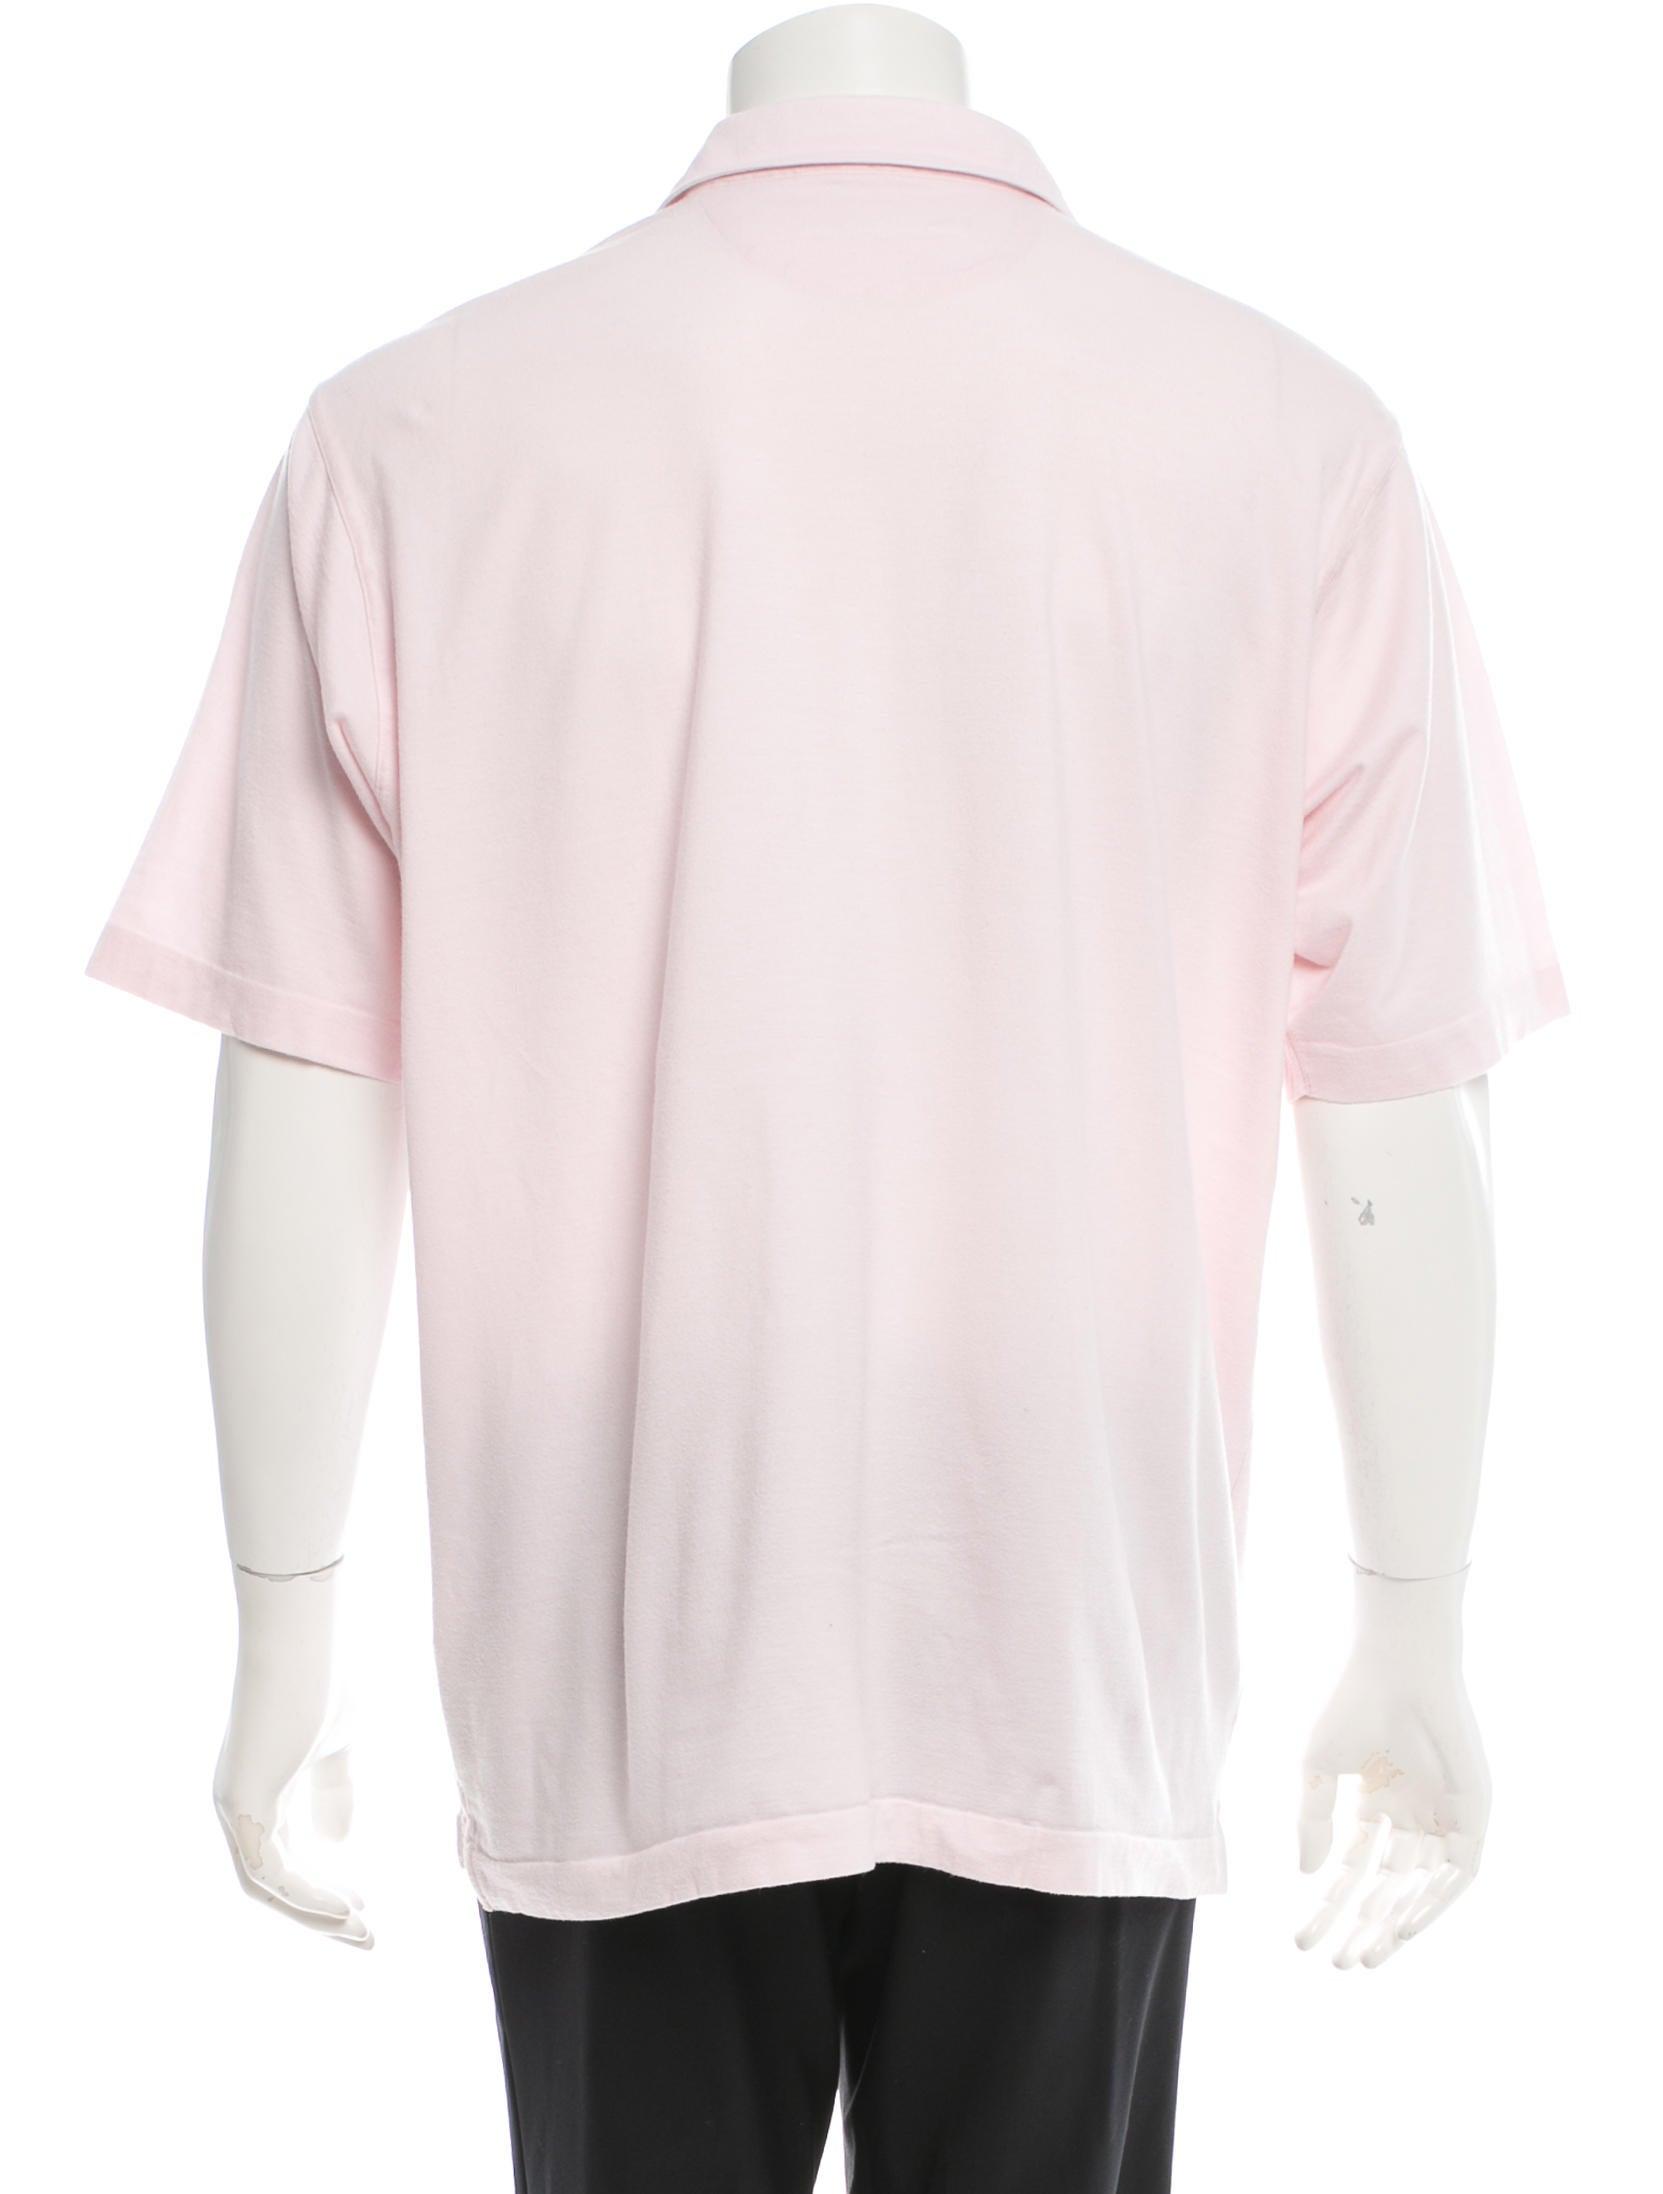 Ermenegildo zegna short sleeve knit polo shirt clothing for Zegna polo shirts sale